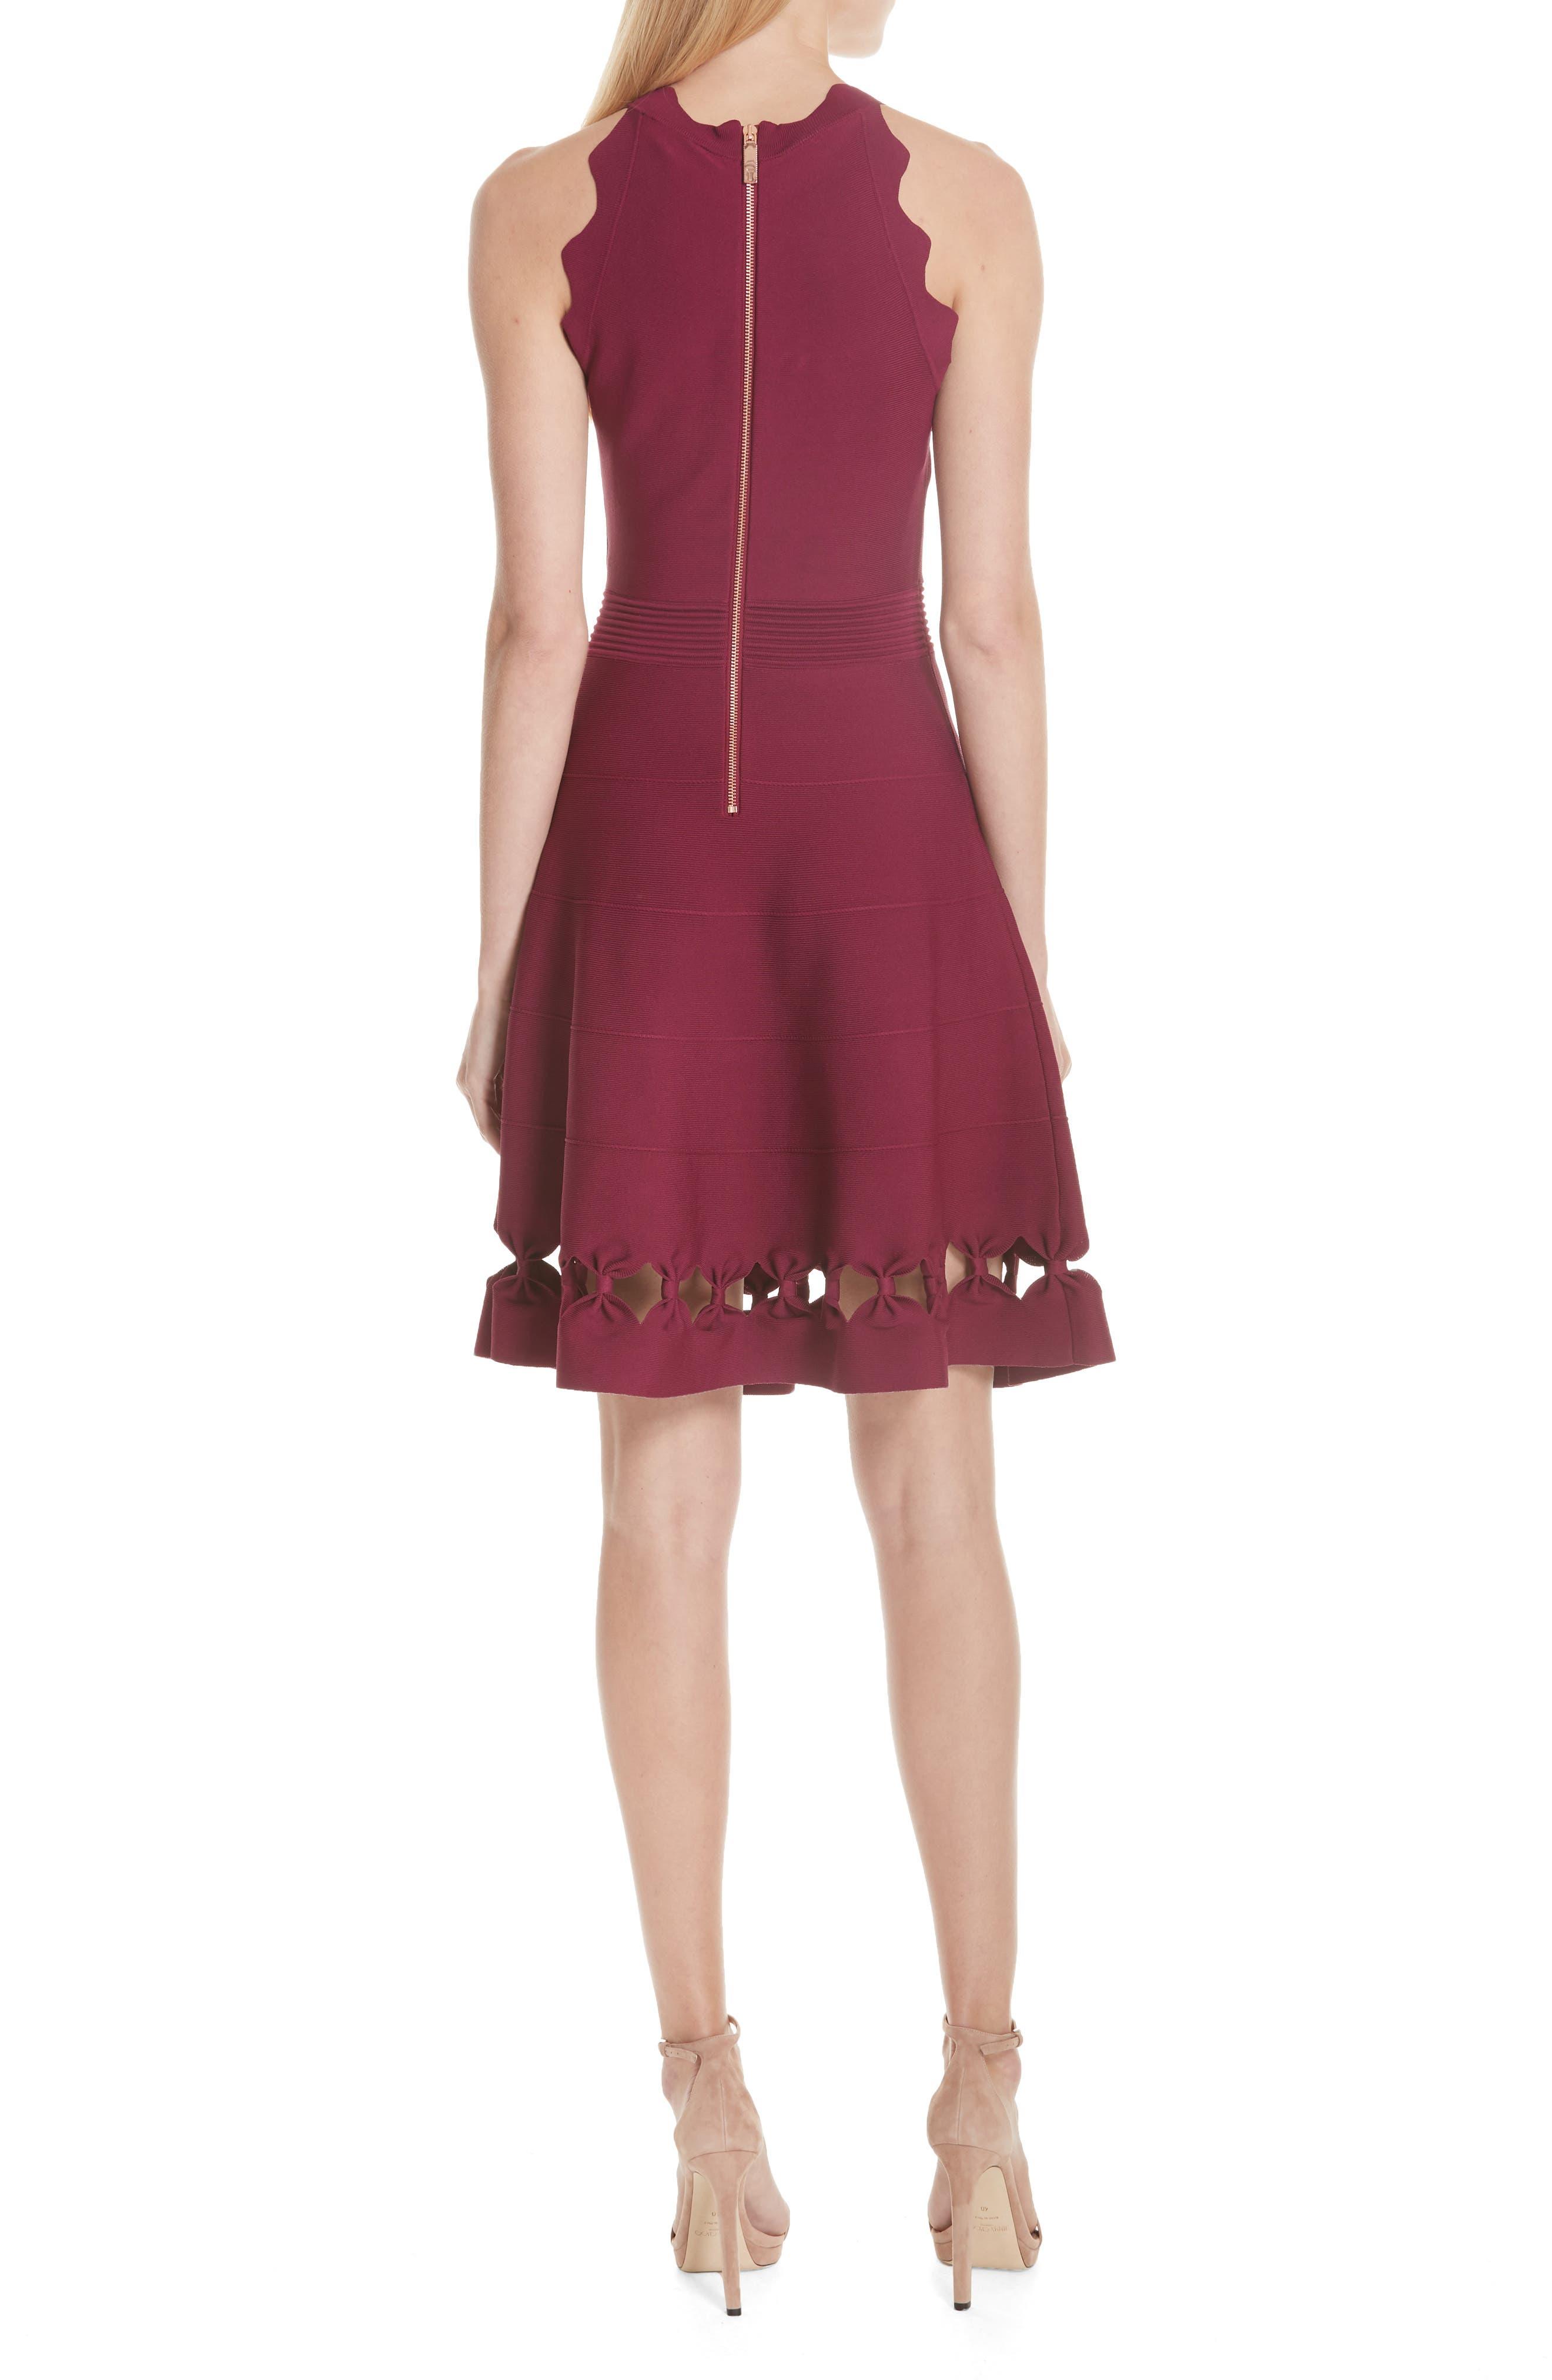 Cherina Bow Detail Fit & Flare Knit Dress,                             Alternate thumbnail 2, color,                             Maroon